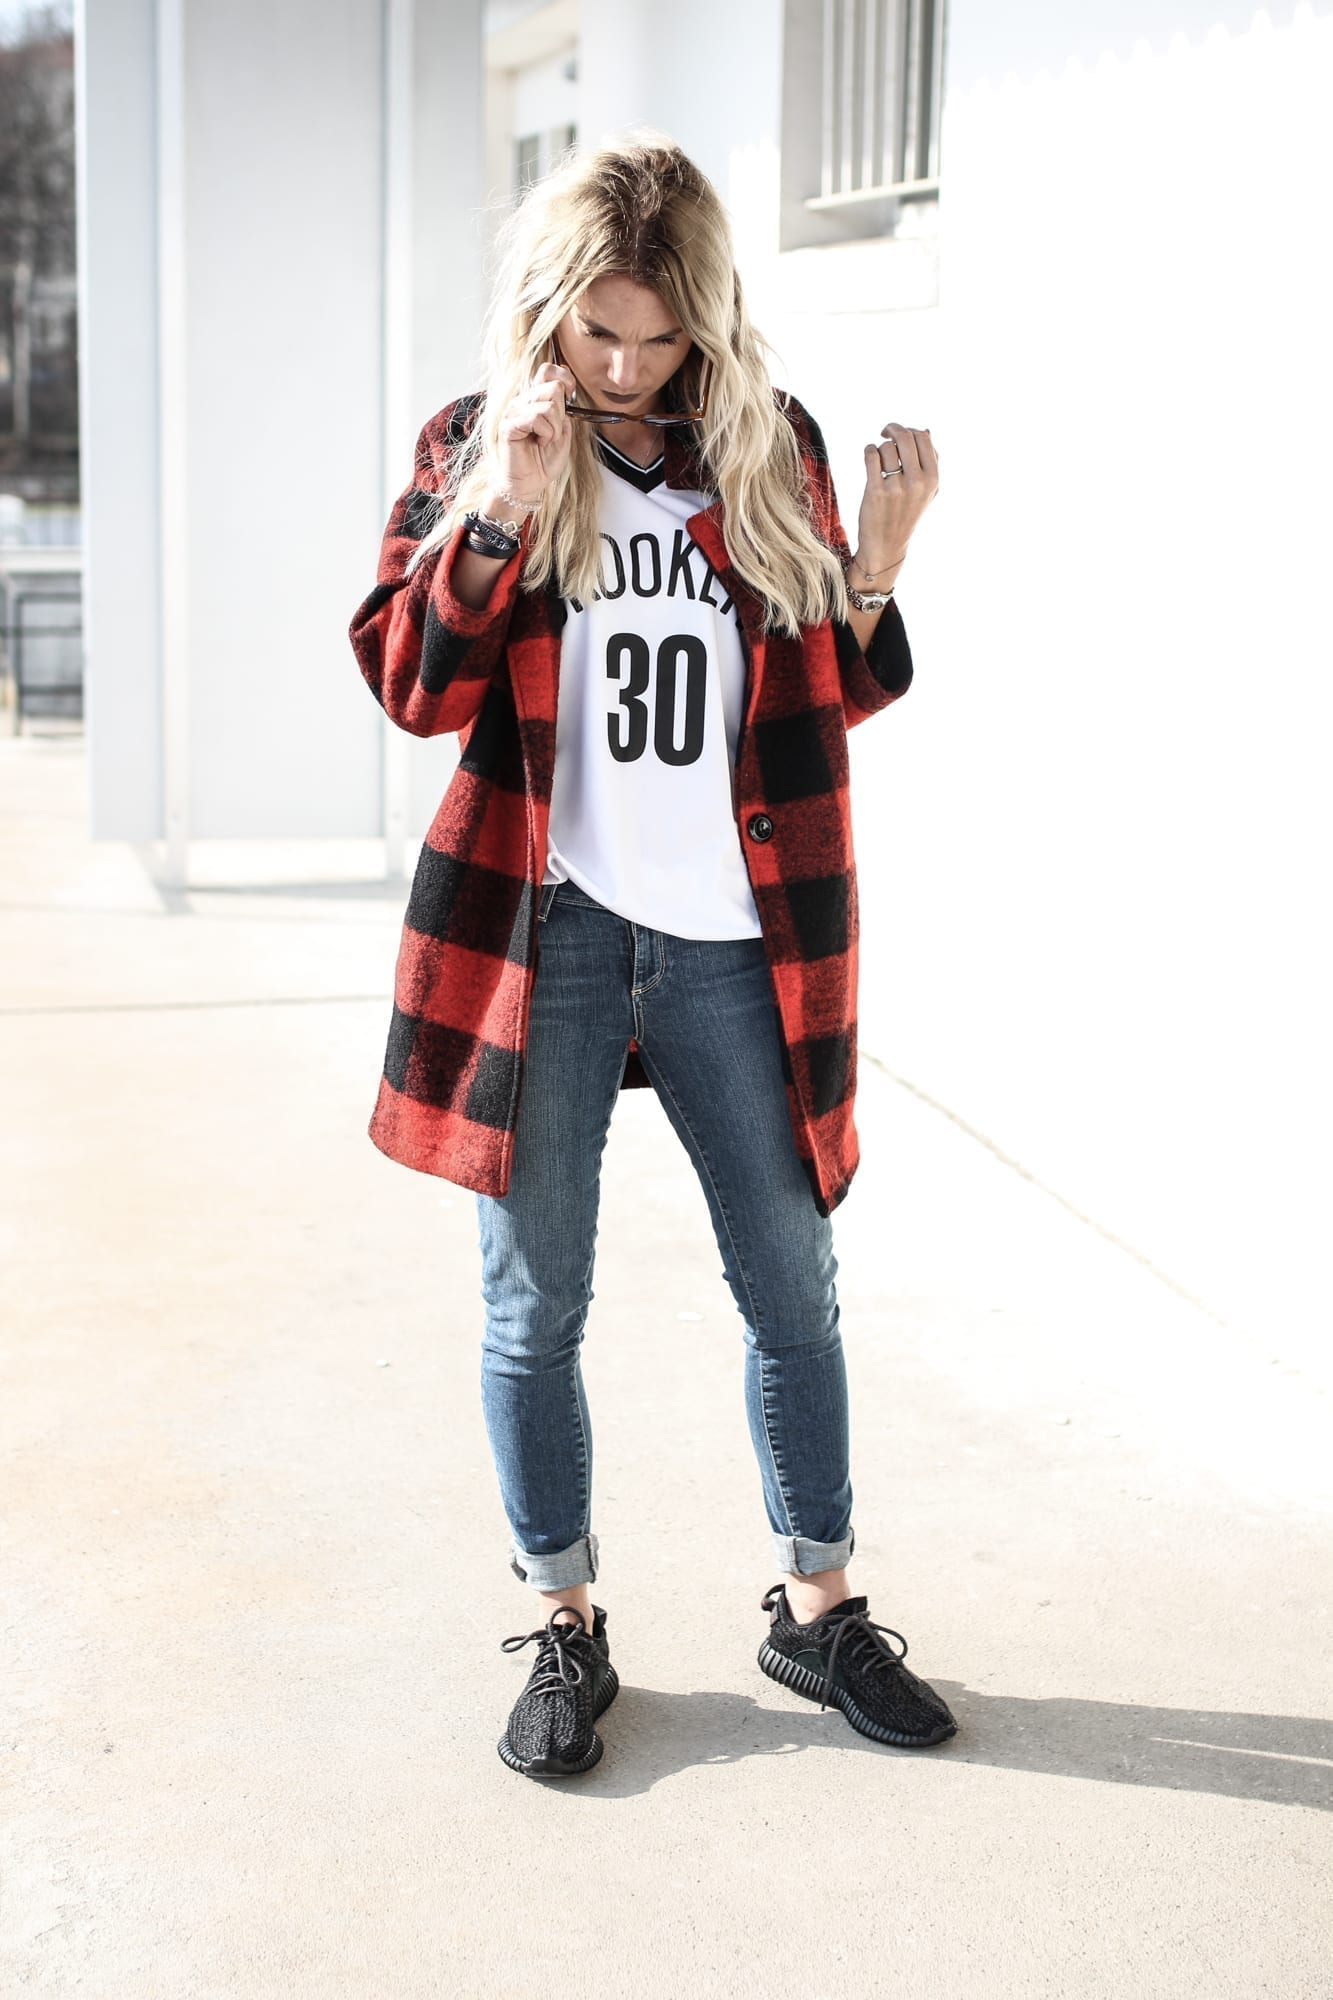 CK_1603_constantlyk_yeezy_fashion-8243